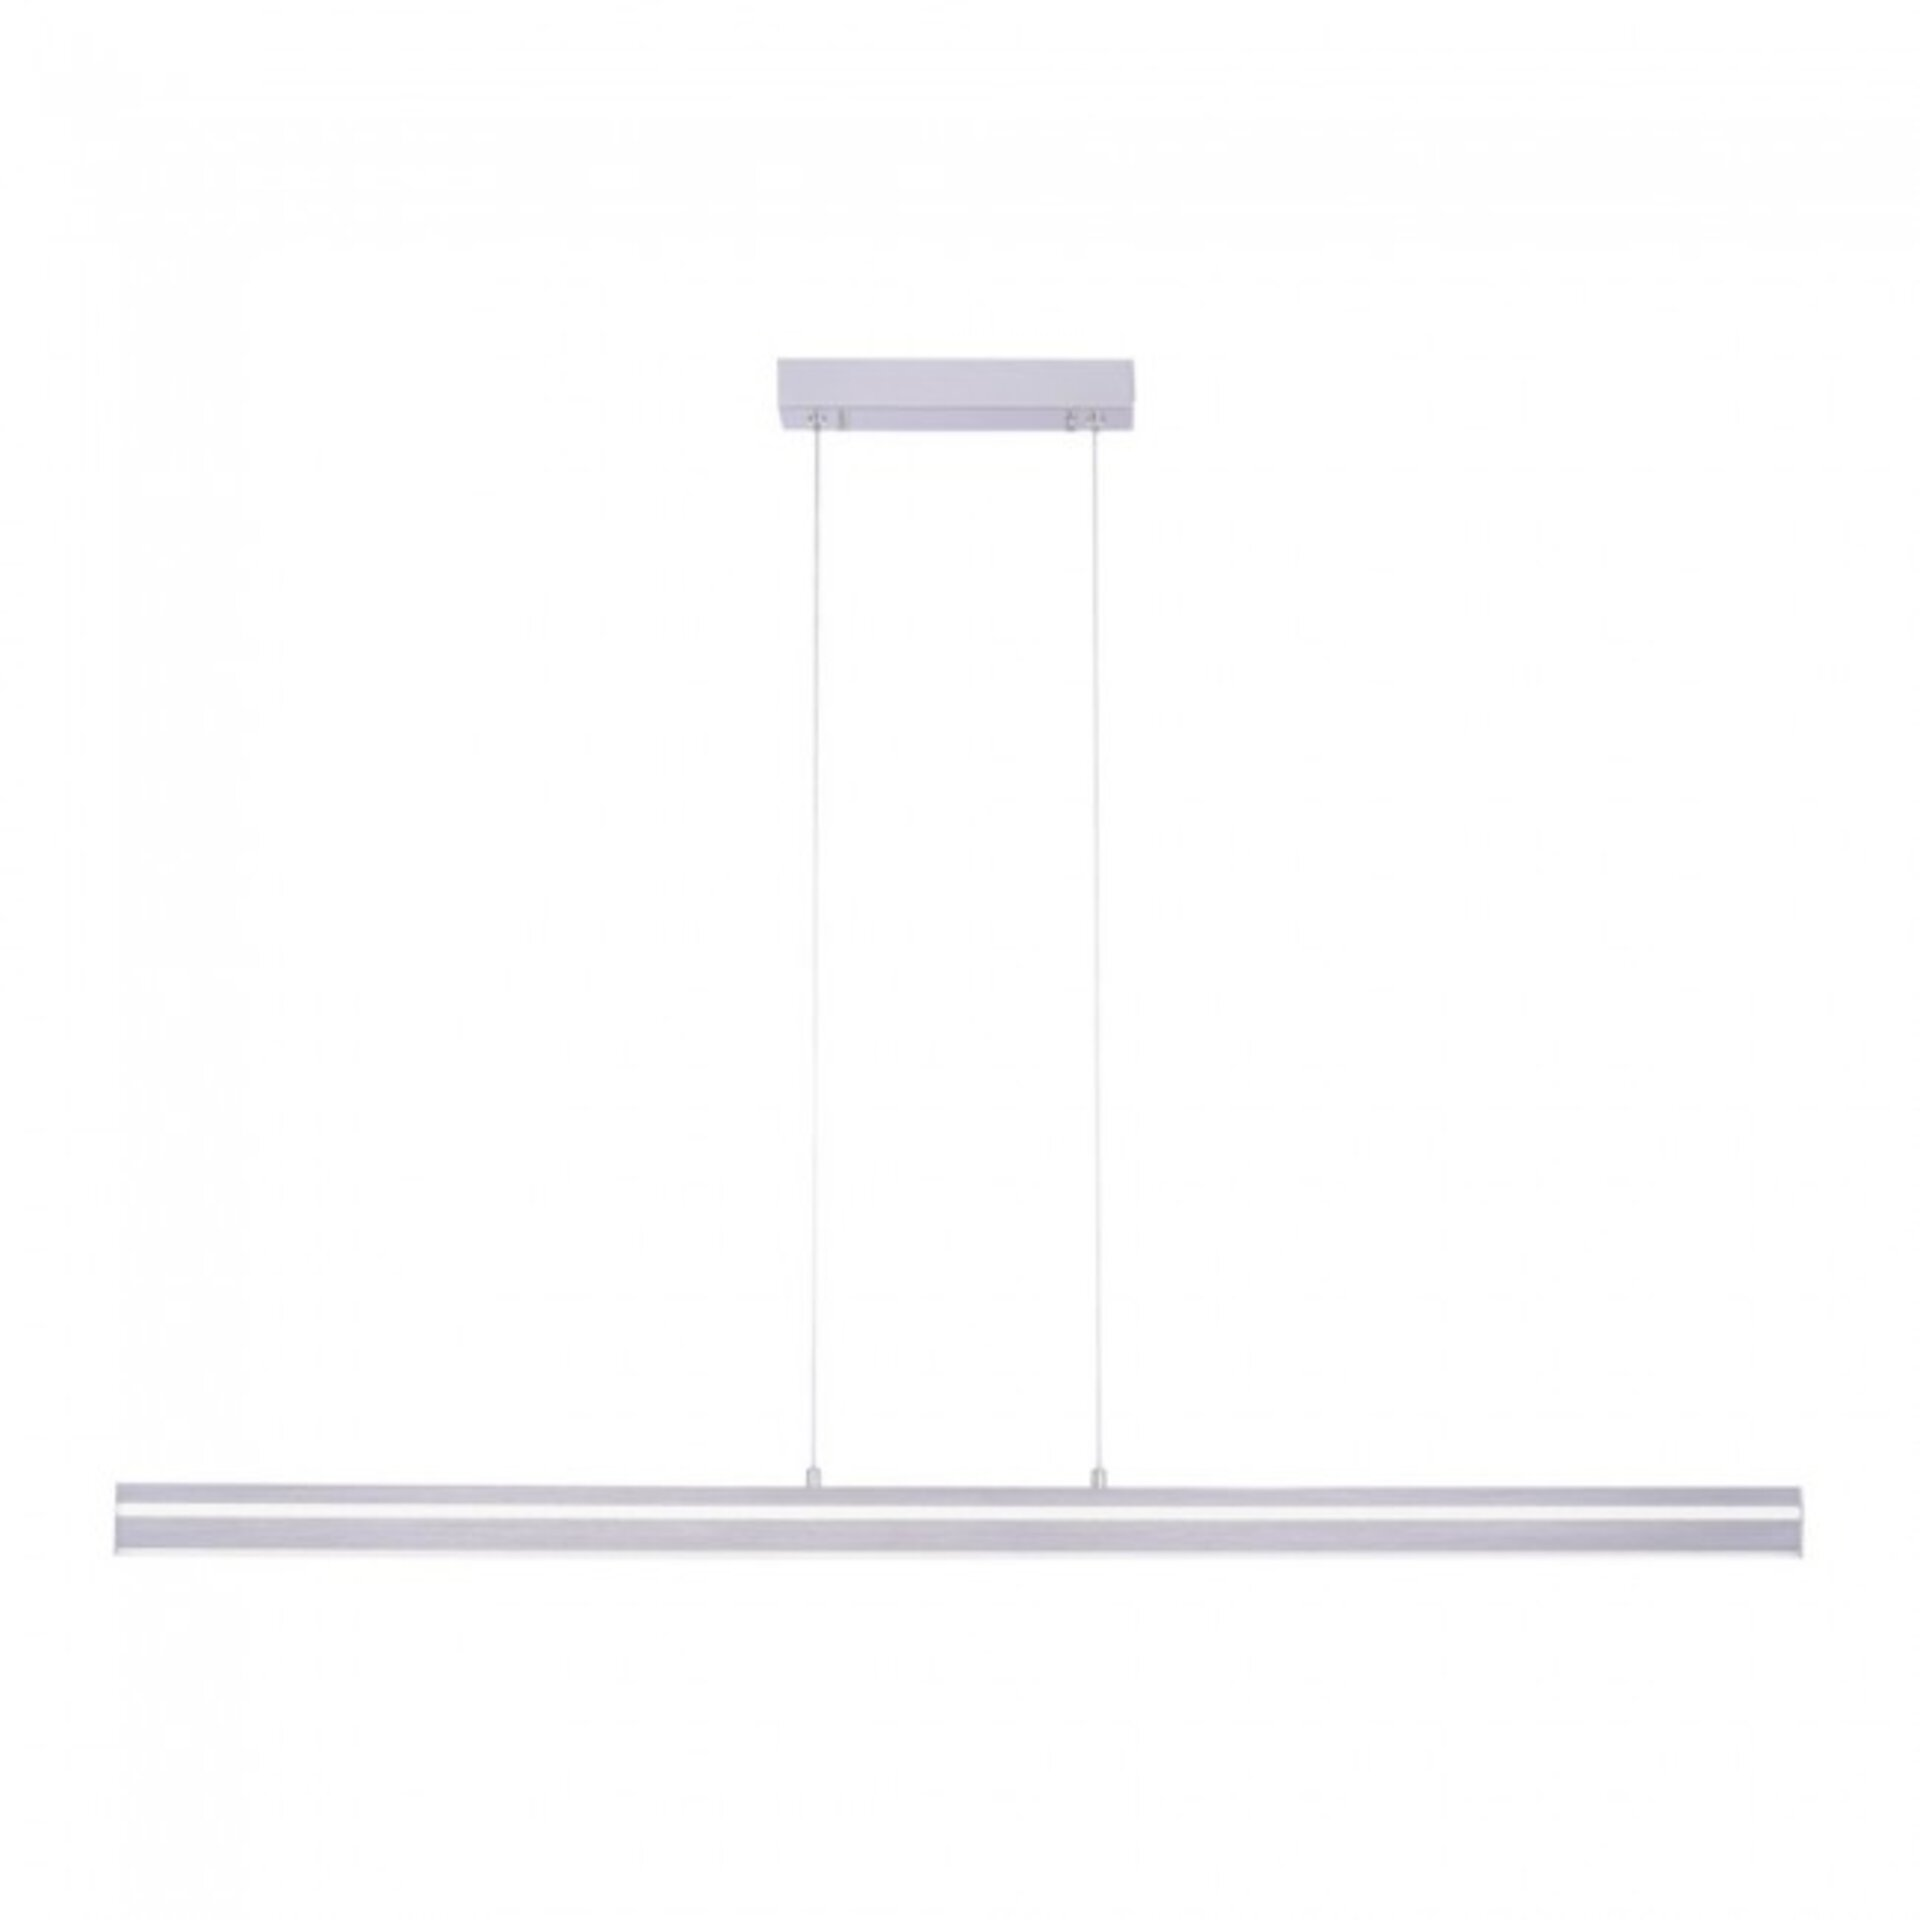 Hängeleuchte Q-VITO Paul Neuhaus Metall silber 7 x 120 x 130 cm